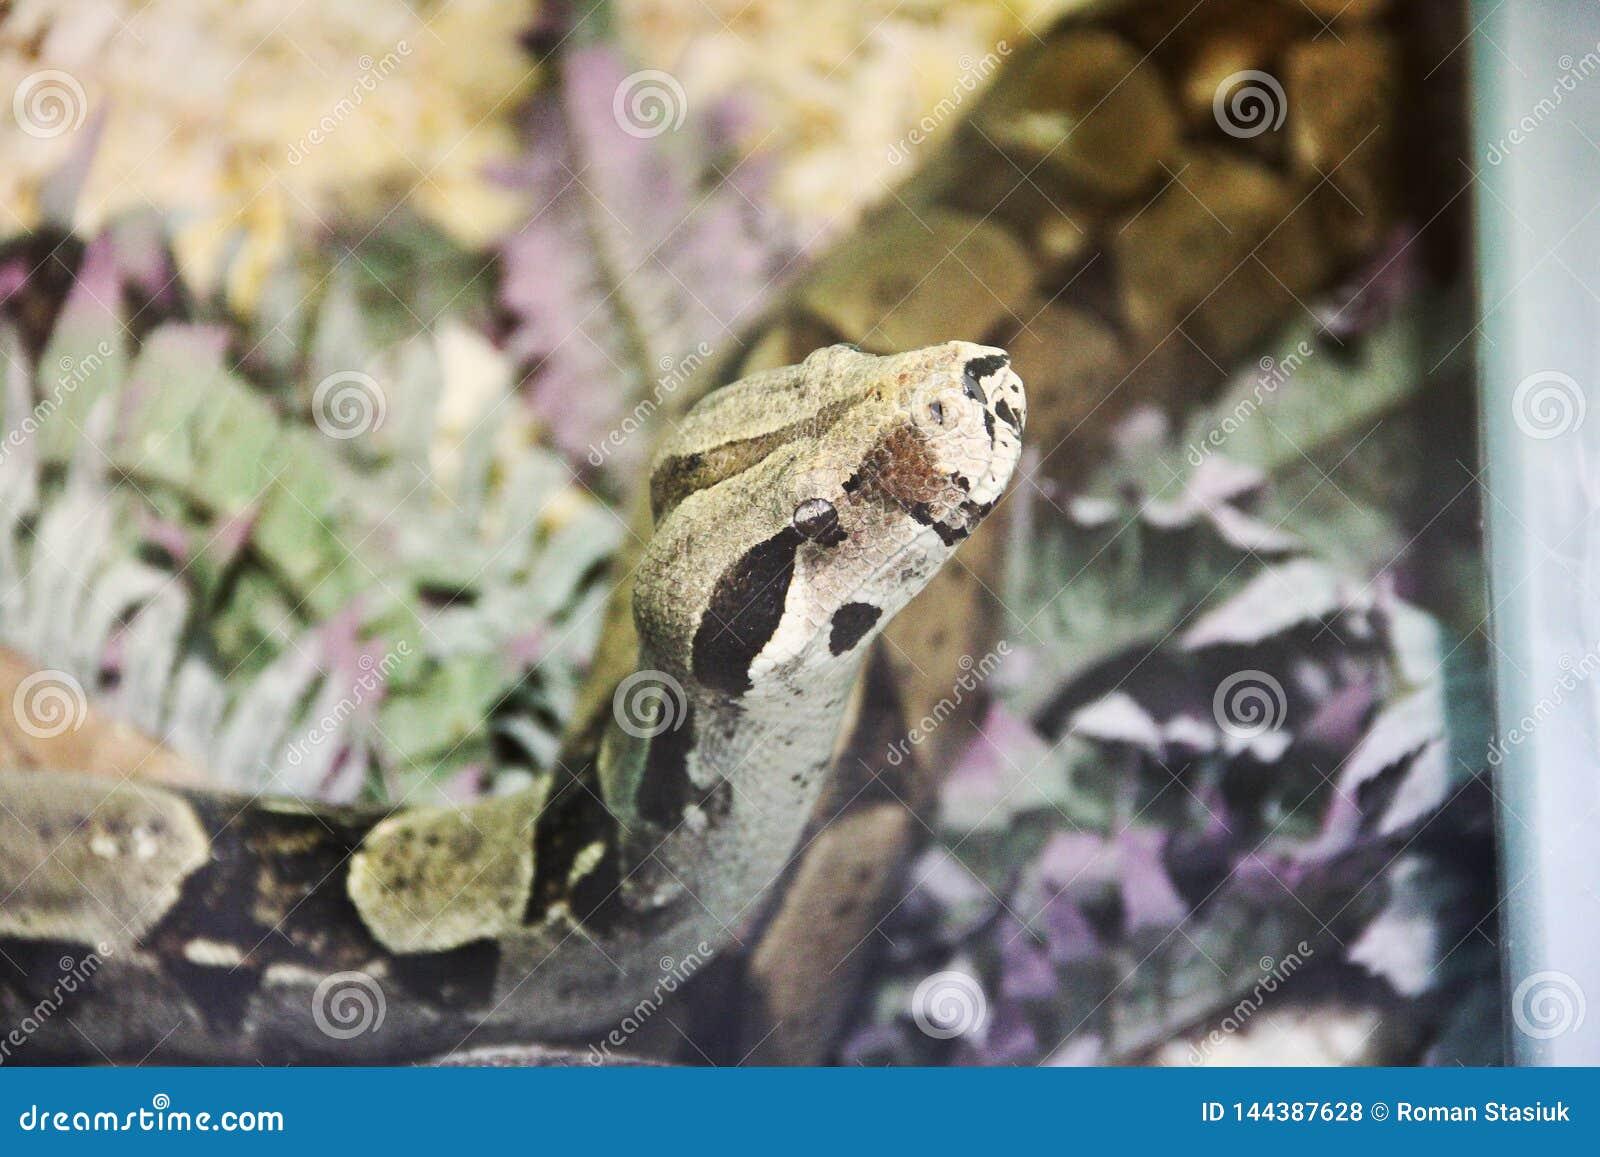 Serpente no terrarium